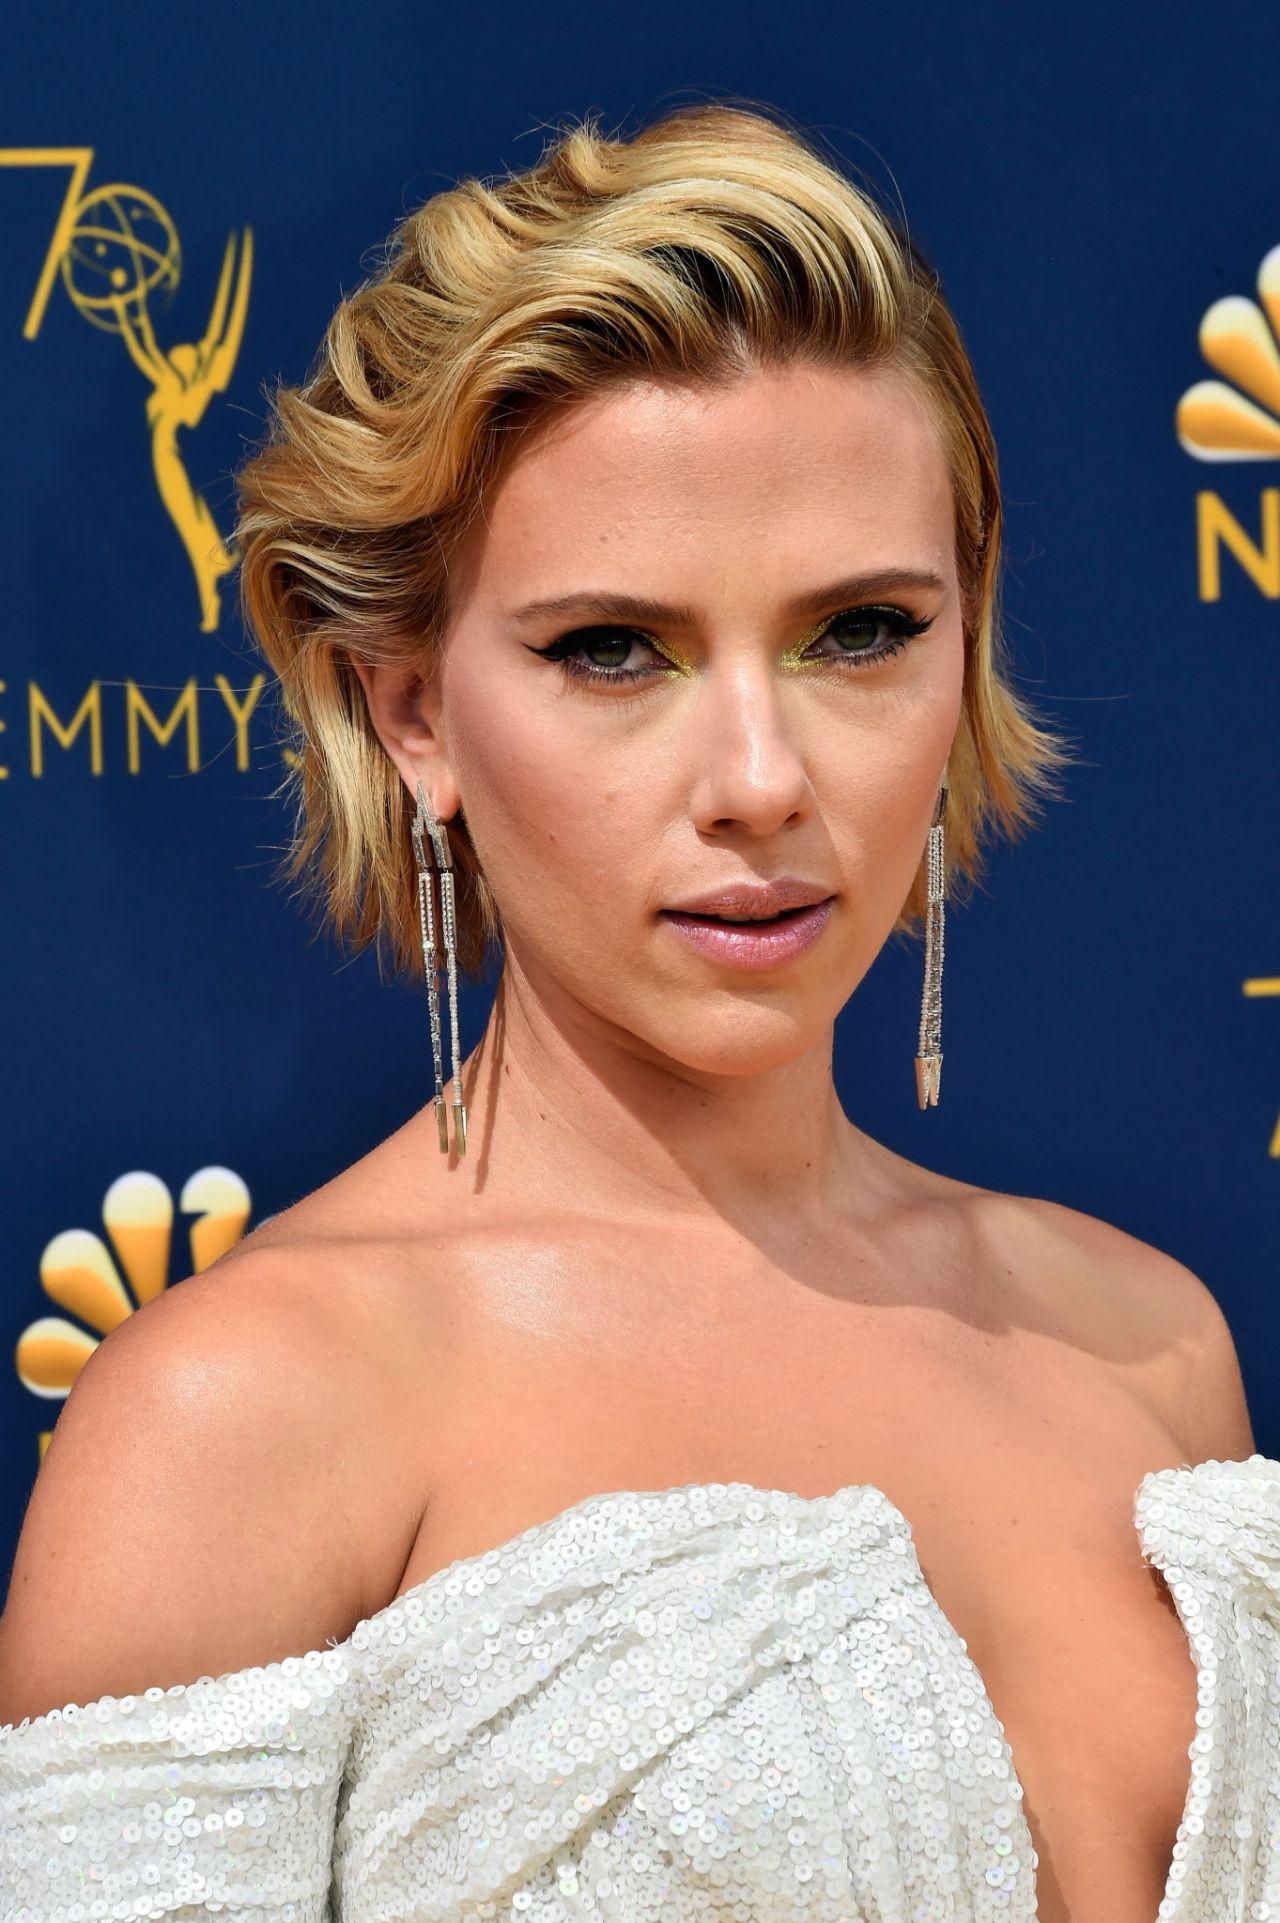 Scarlett Johansson – 2018 Emmy Awards Scarlett Johansson